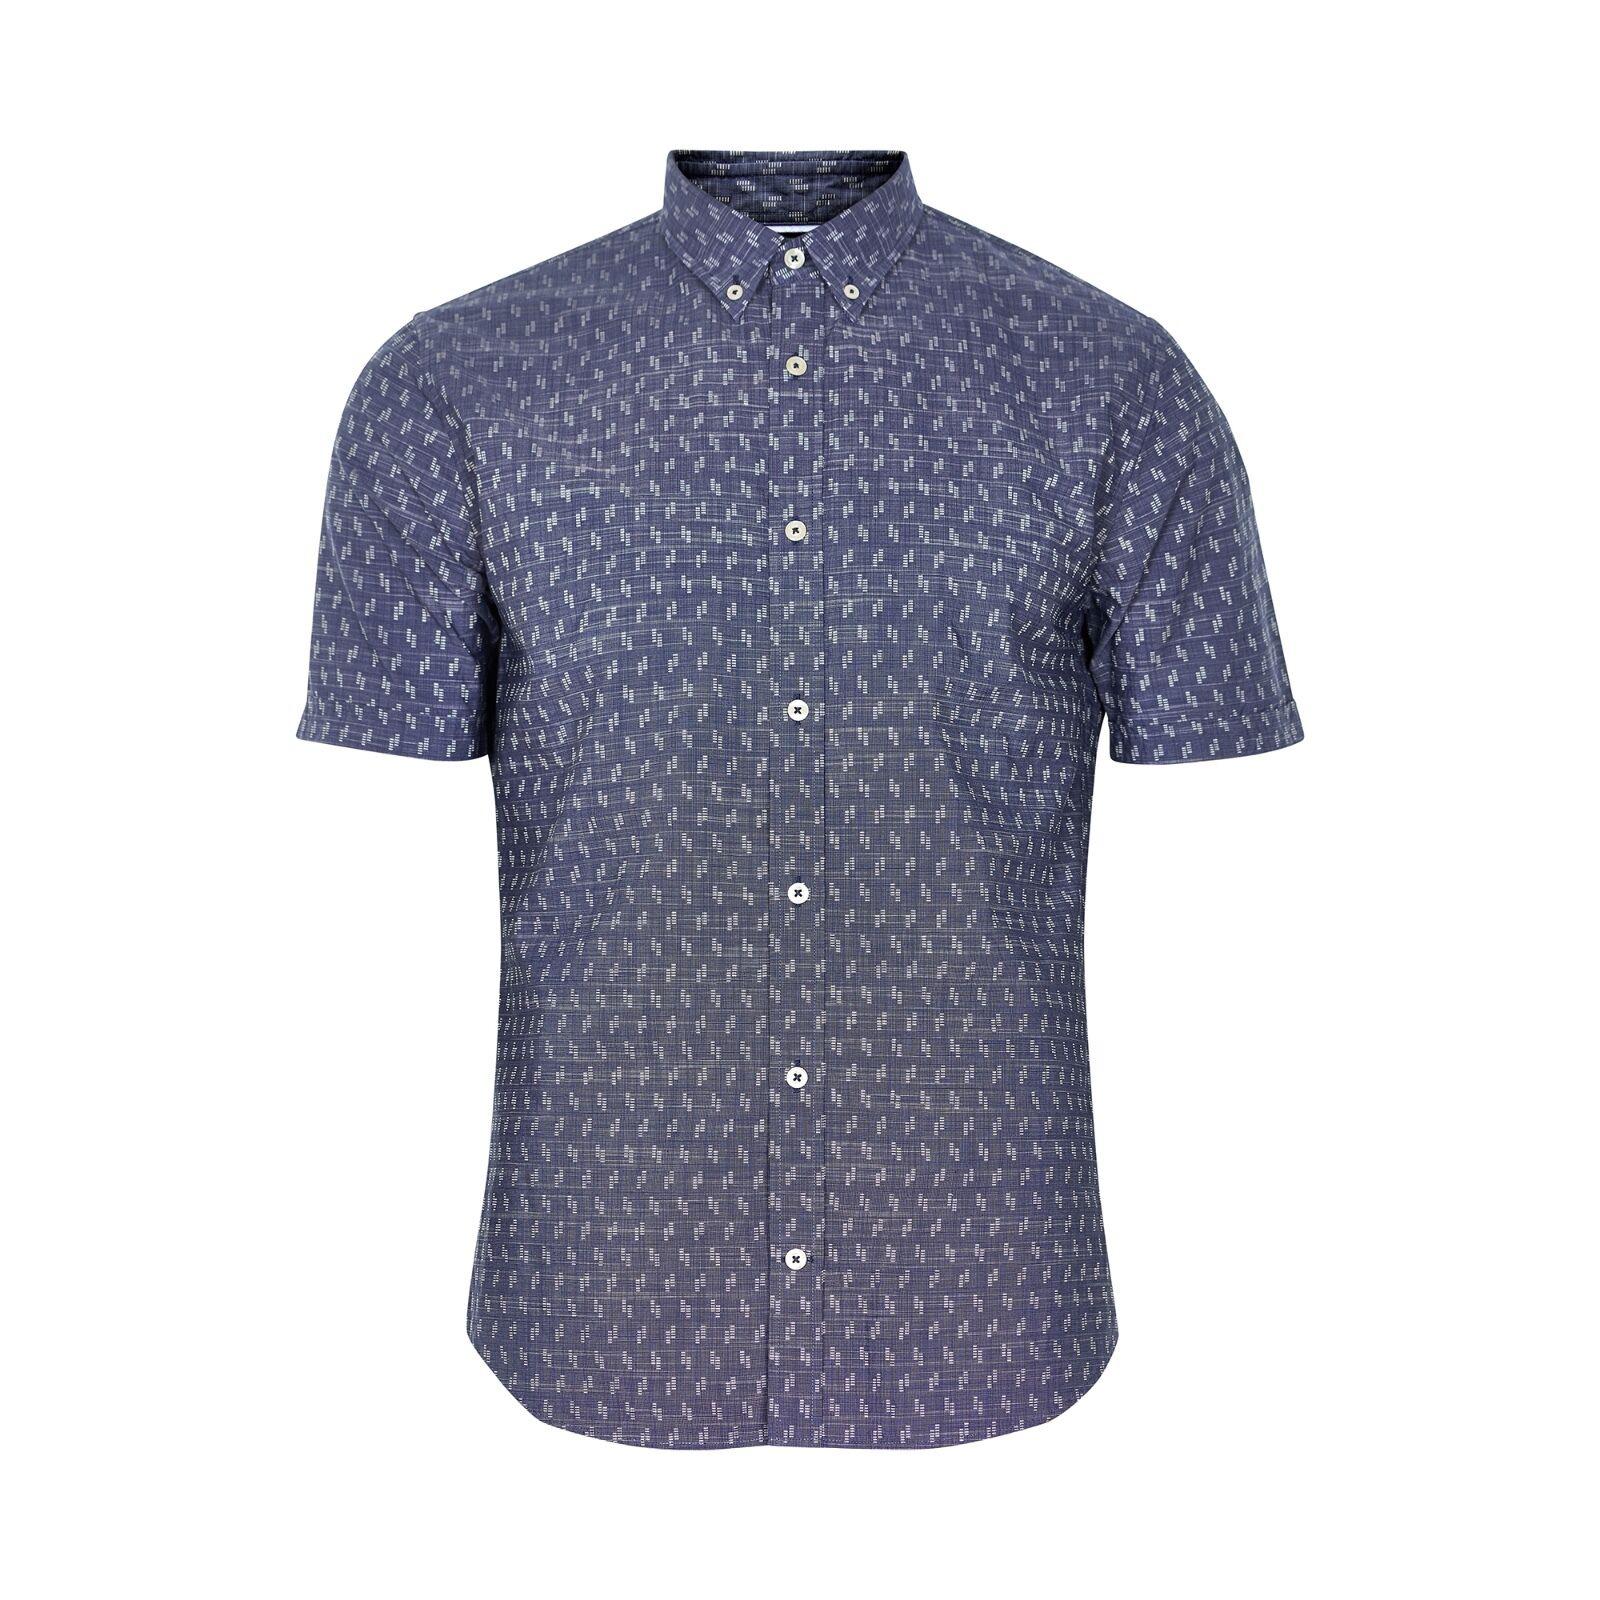 Matinique Trostol BD Geo Jacquard Shirt Navy Blazer - Extra Large